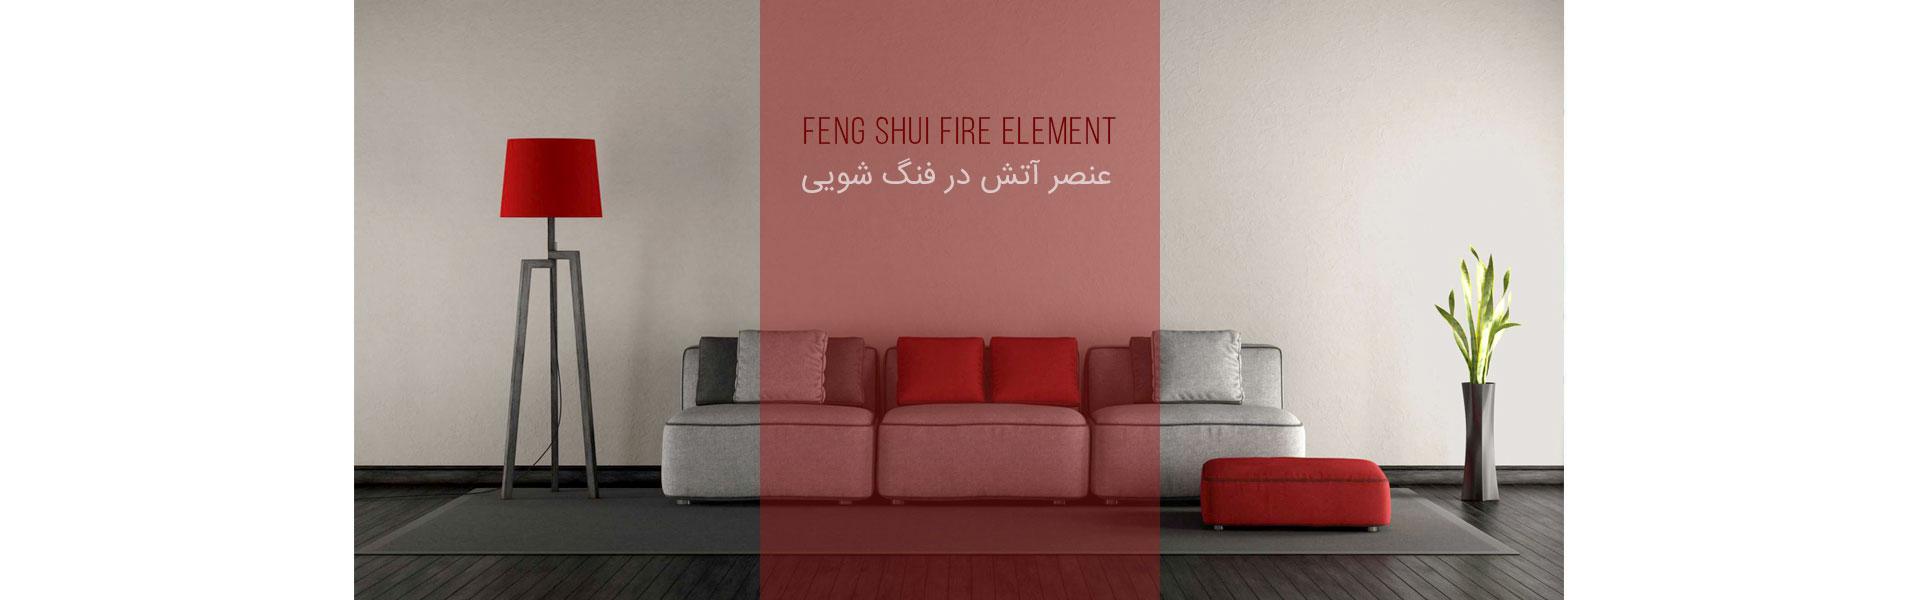 decorasion fengshui atash12 - عنصر آتش در فنگ شویی